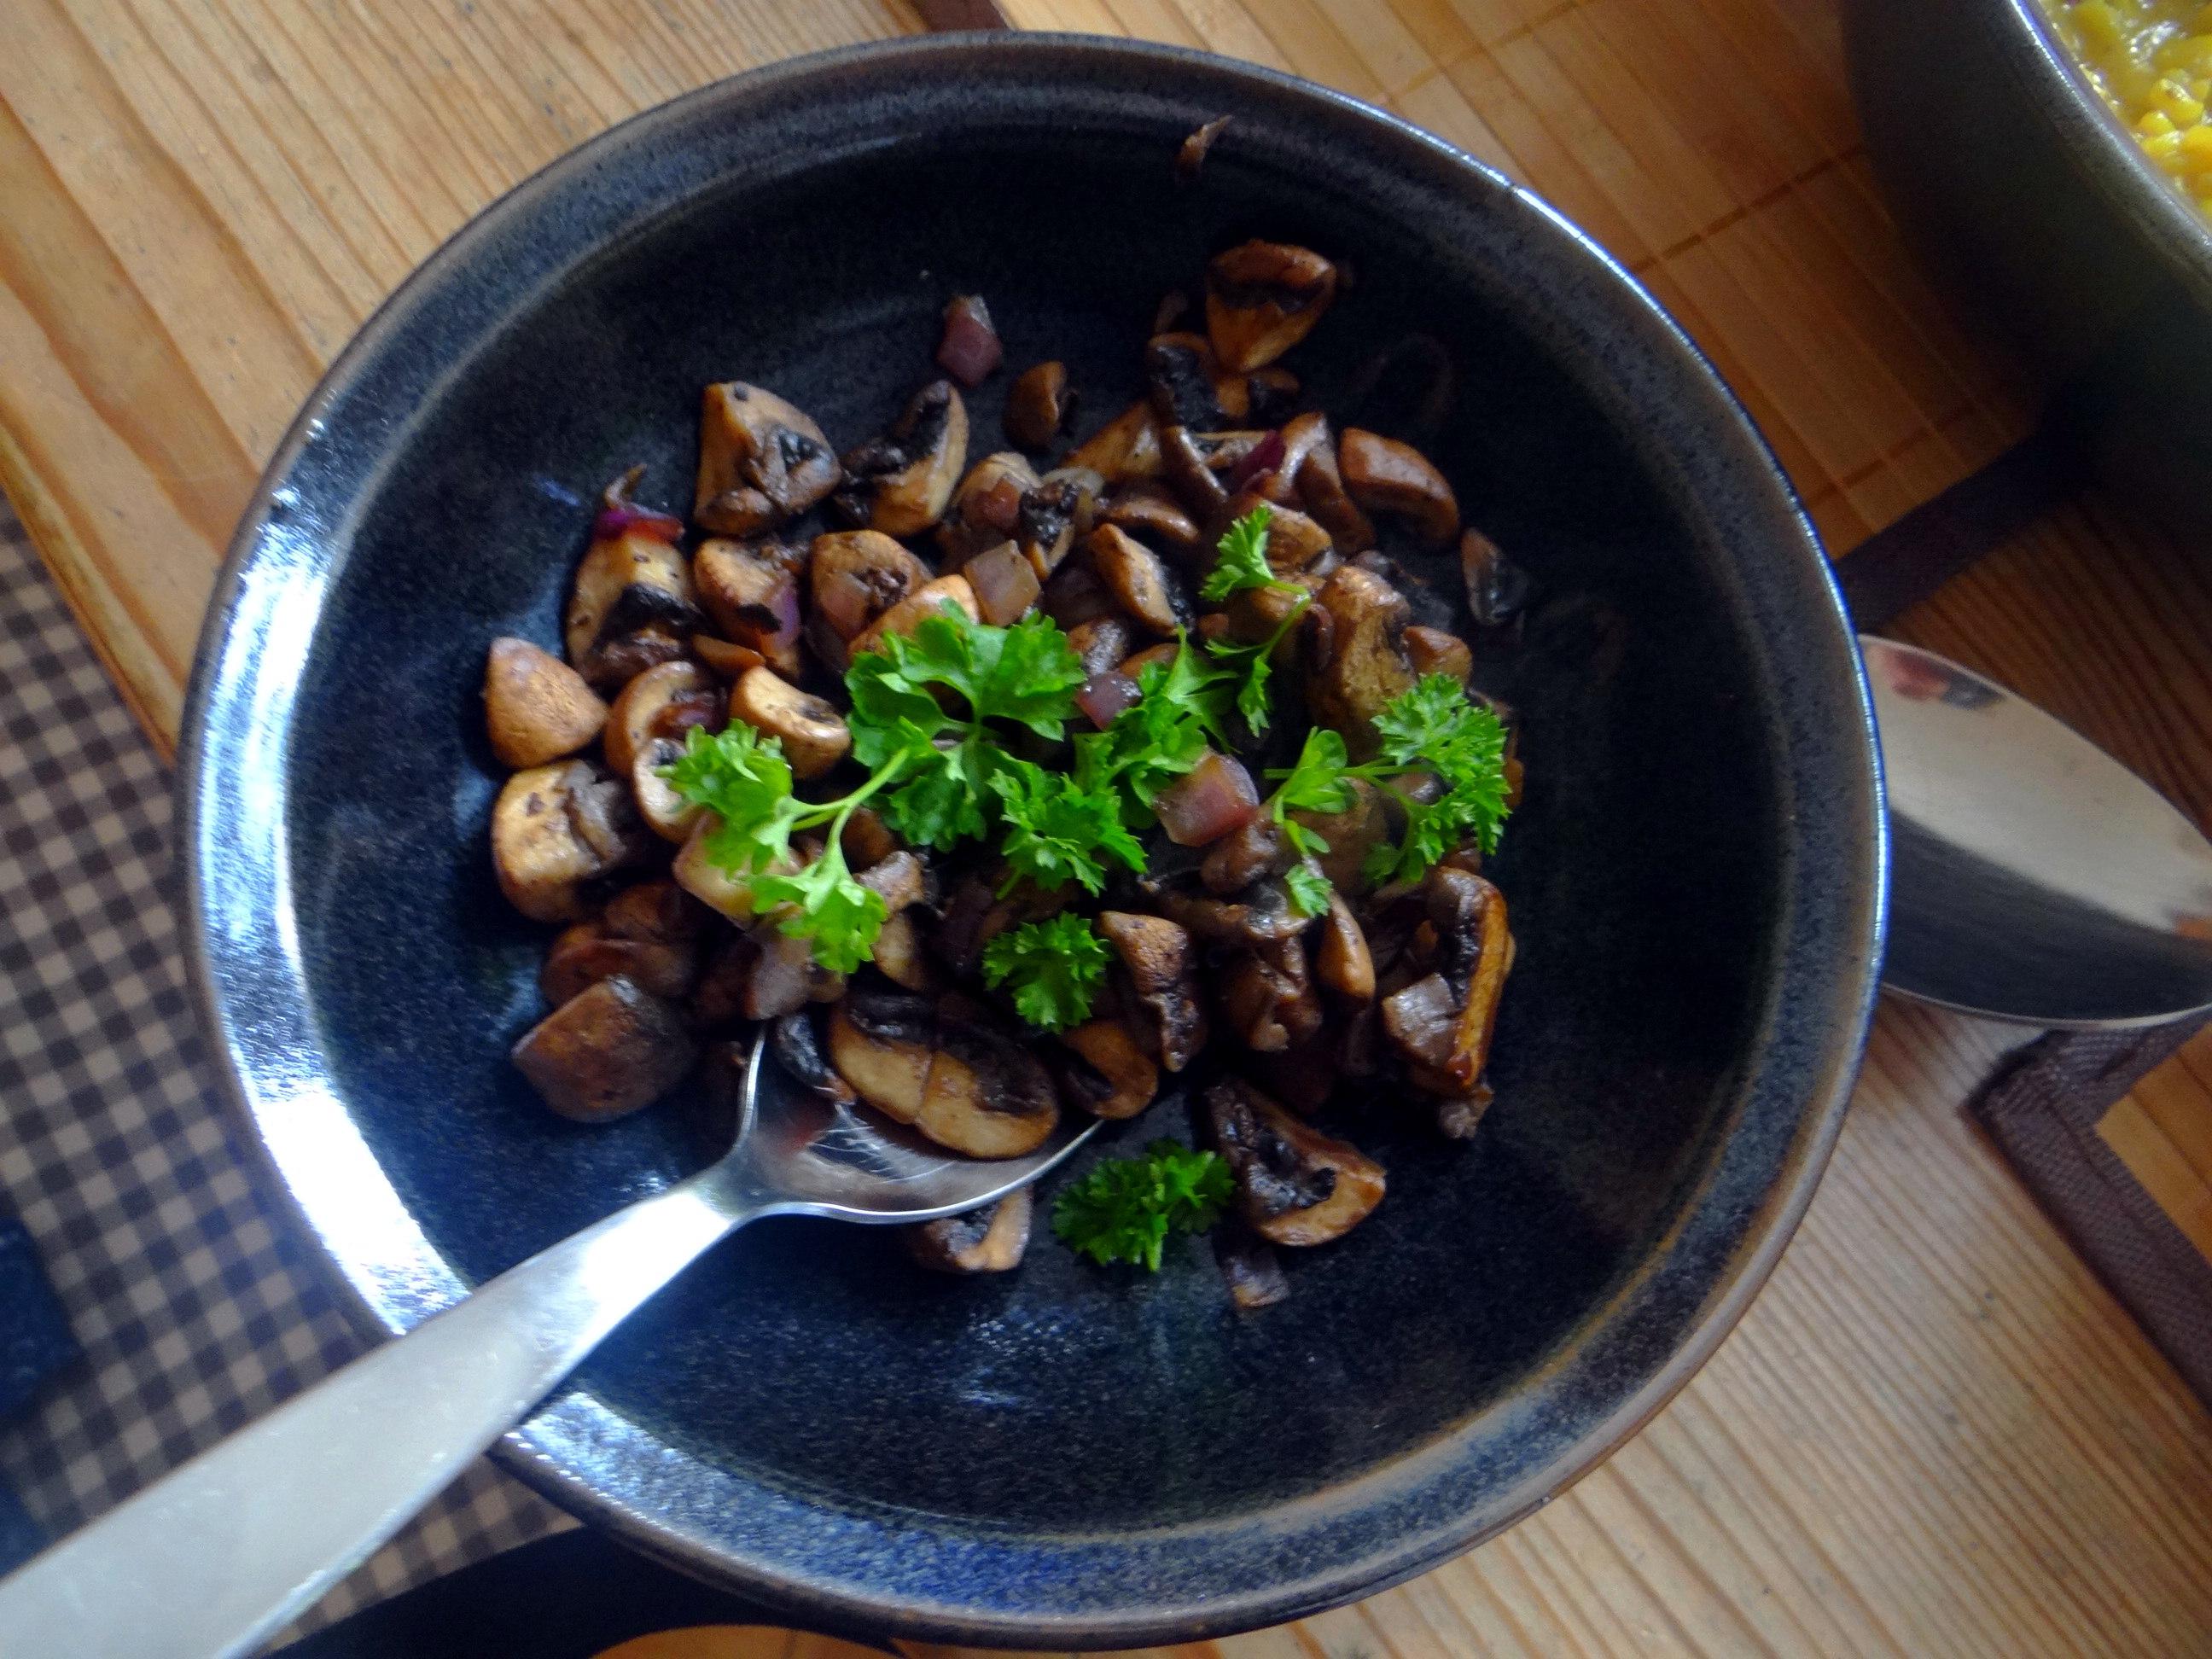 Austernpilz Risotto,Chamignon,Käse Cräcker,Salat,Quitten (13)